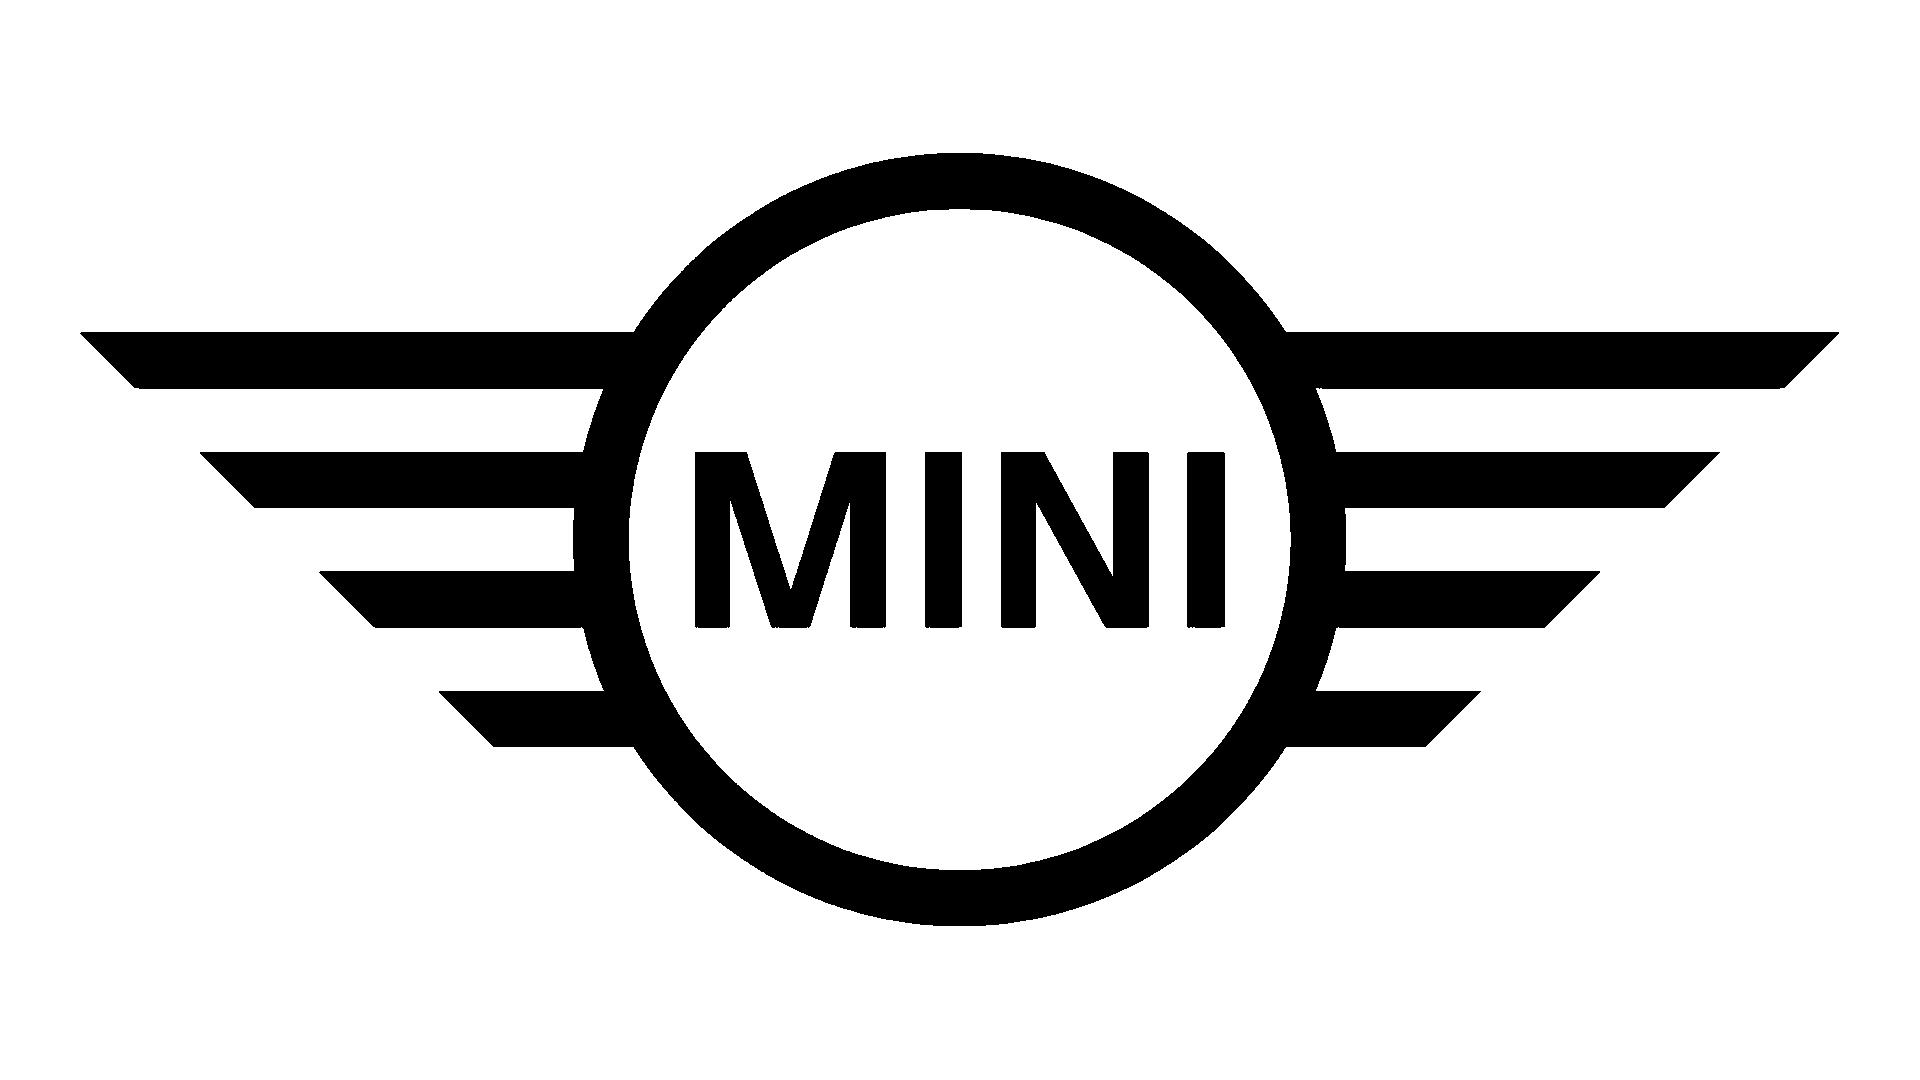 Le Logo Voiture Mini Embleme Sigle Lancia